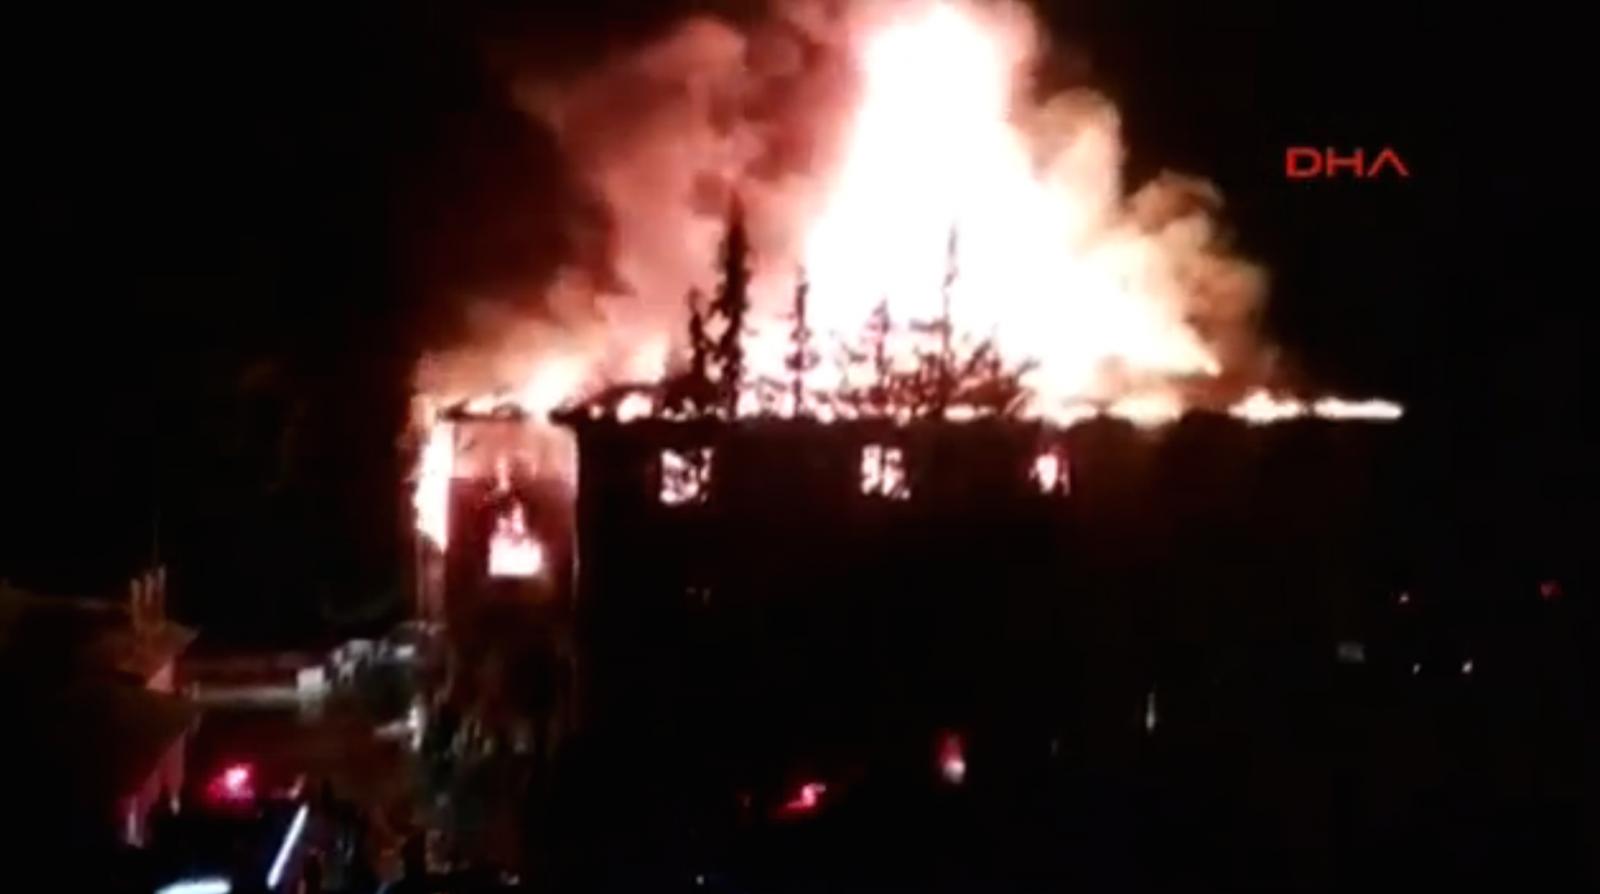 Adana fire